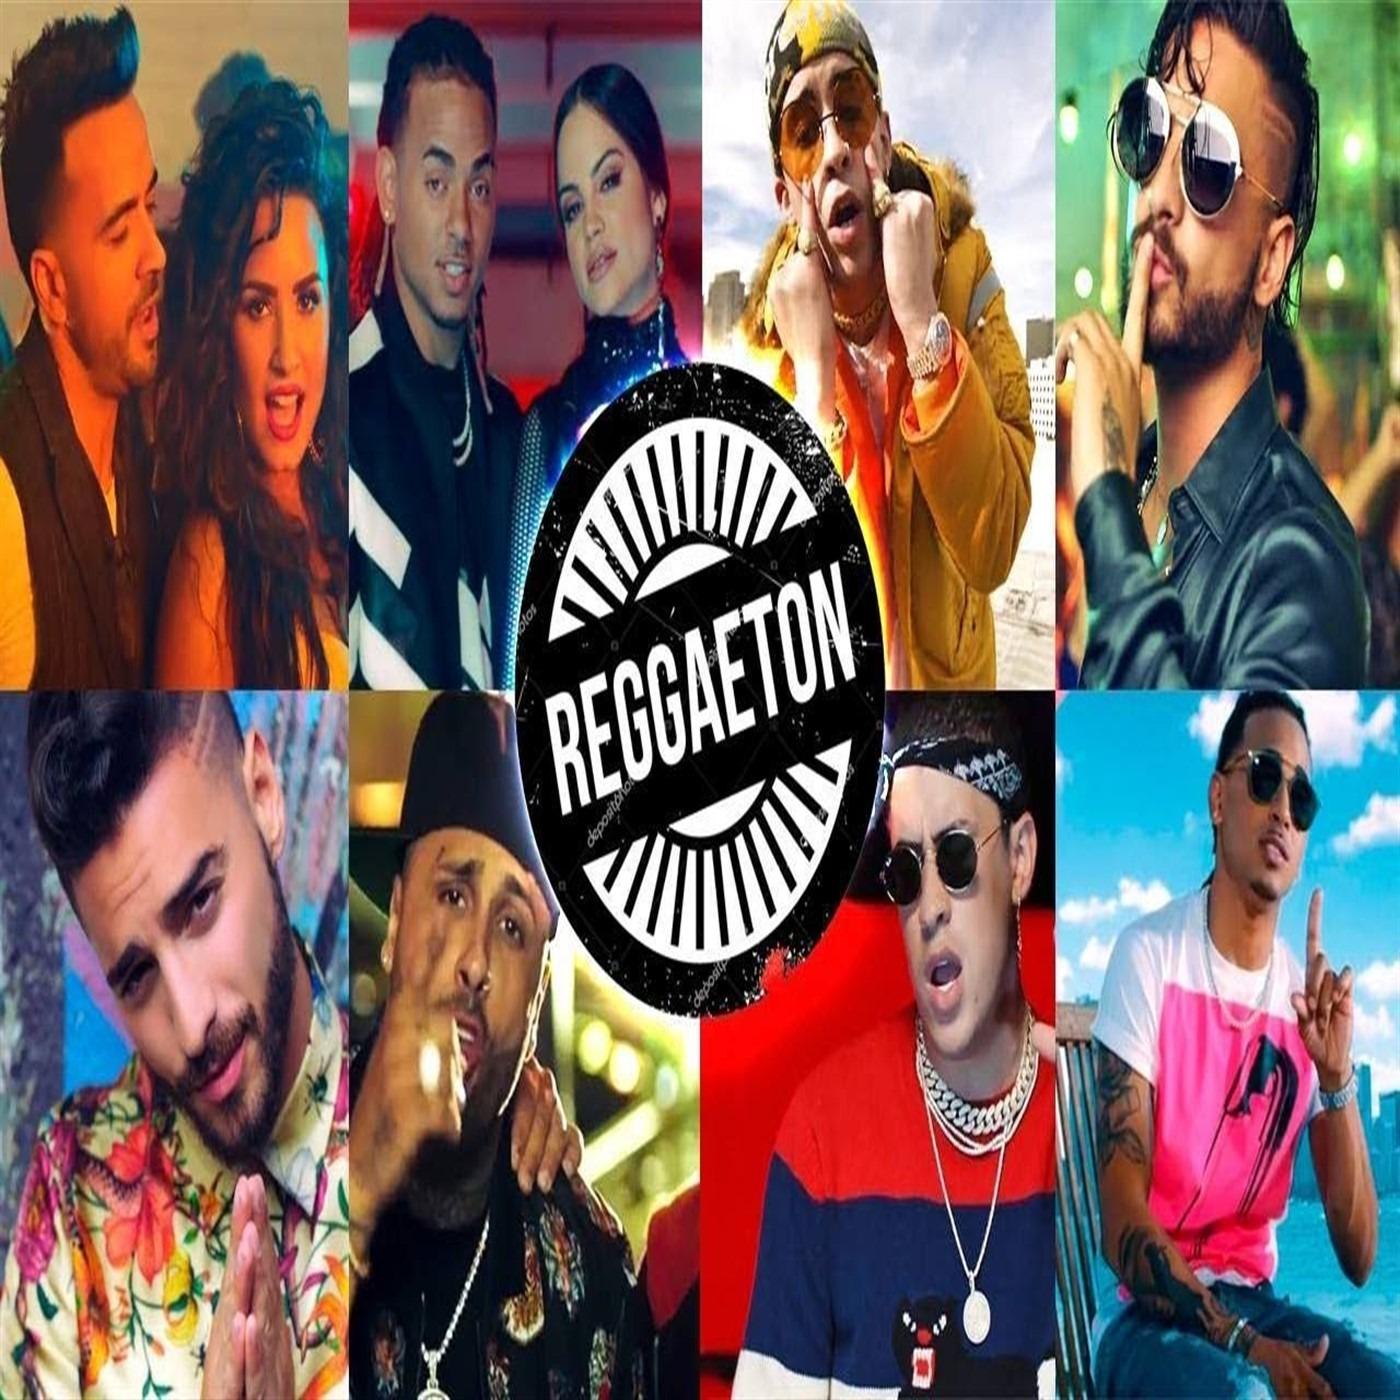 Reggaeton 2020 Reggaeton Mix 2020 Lo Mas Nuevo Daddy Yankee J Balvin Maluma Bad Bunny Reggeaton Hits Podcast Podcast Podtail